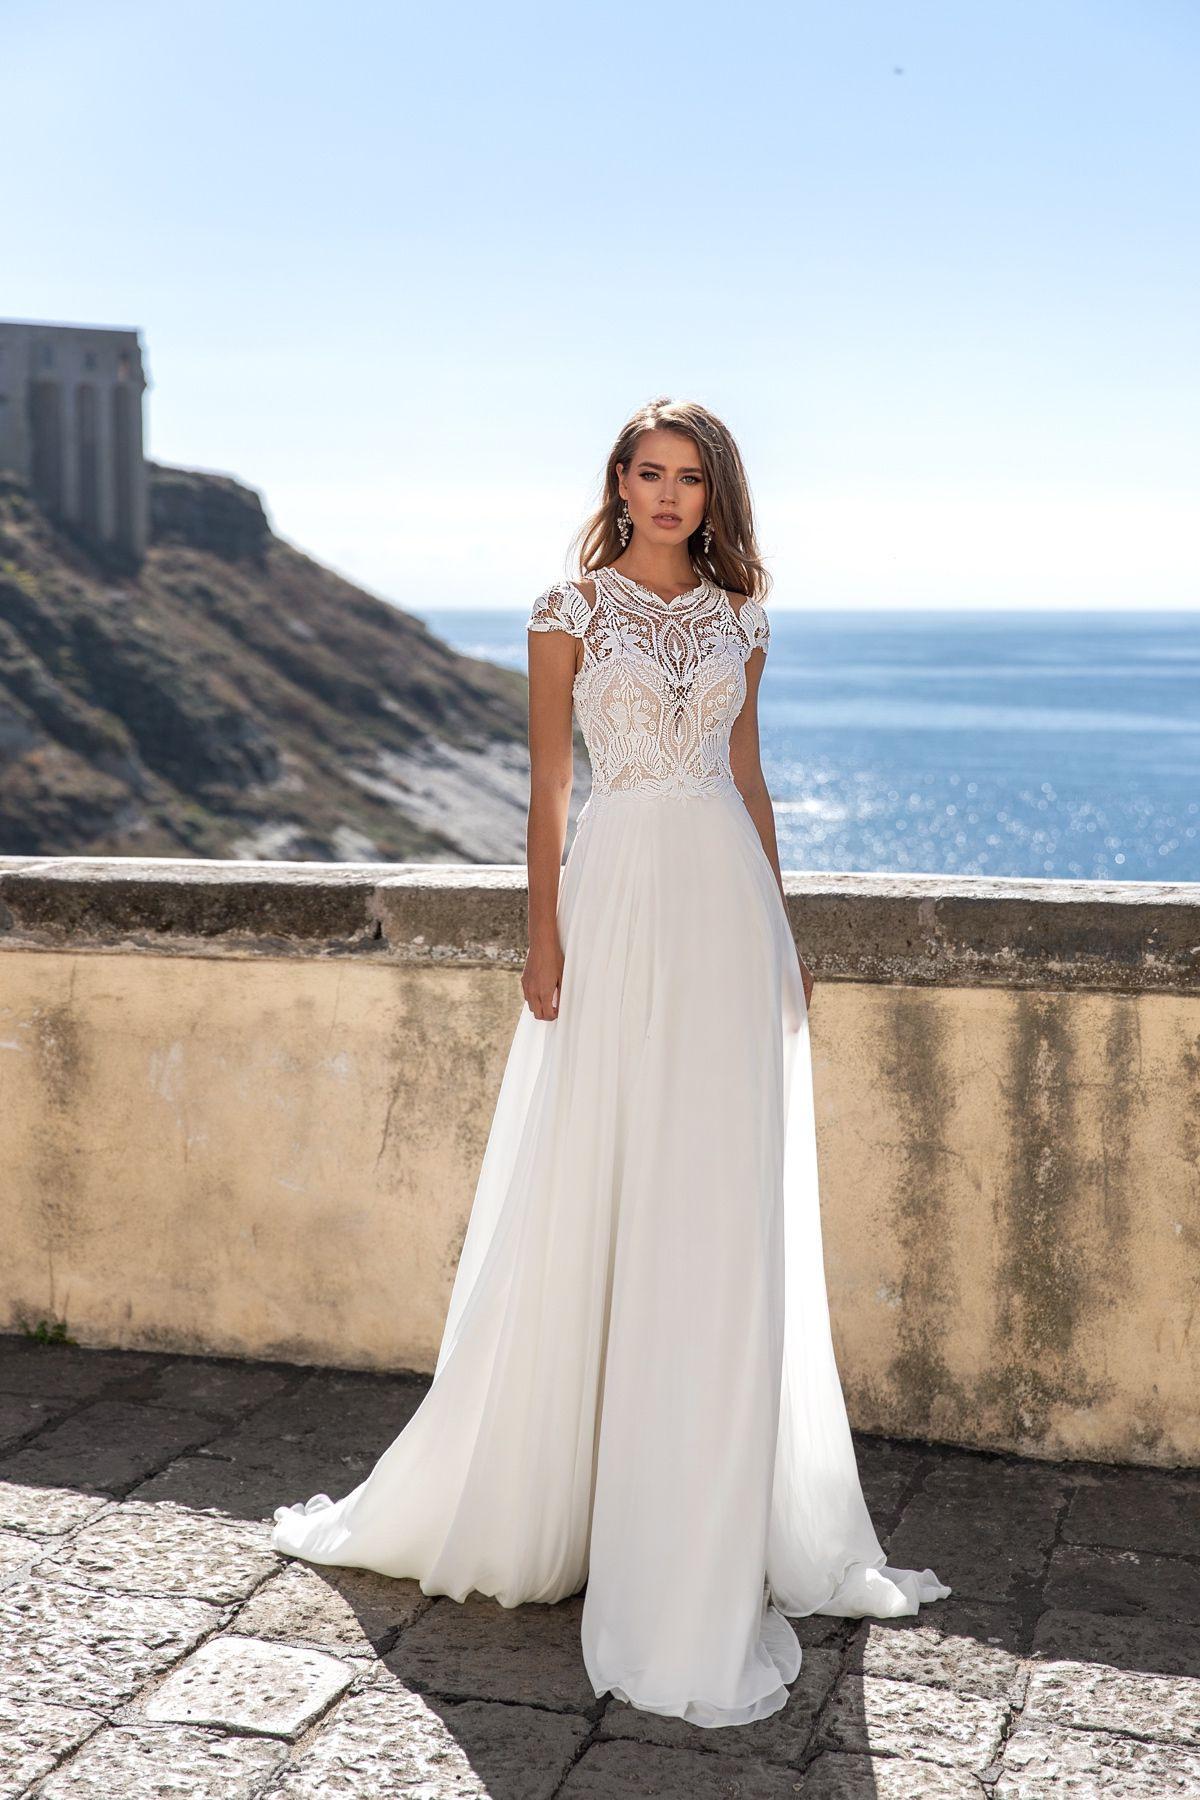 Monica Loretti  Style 8119  Brautmode Hochzeitskleid